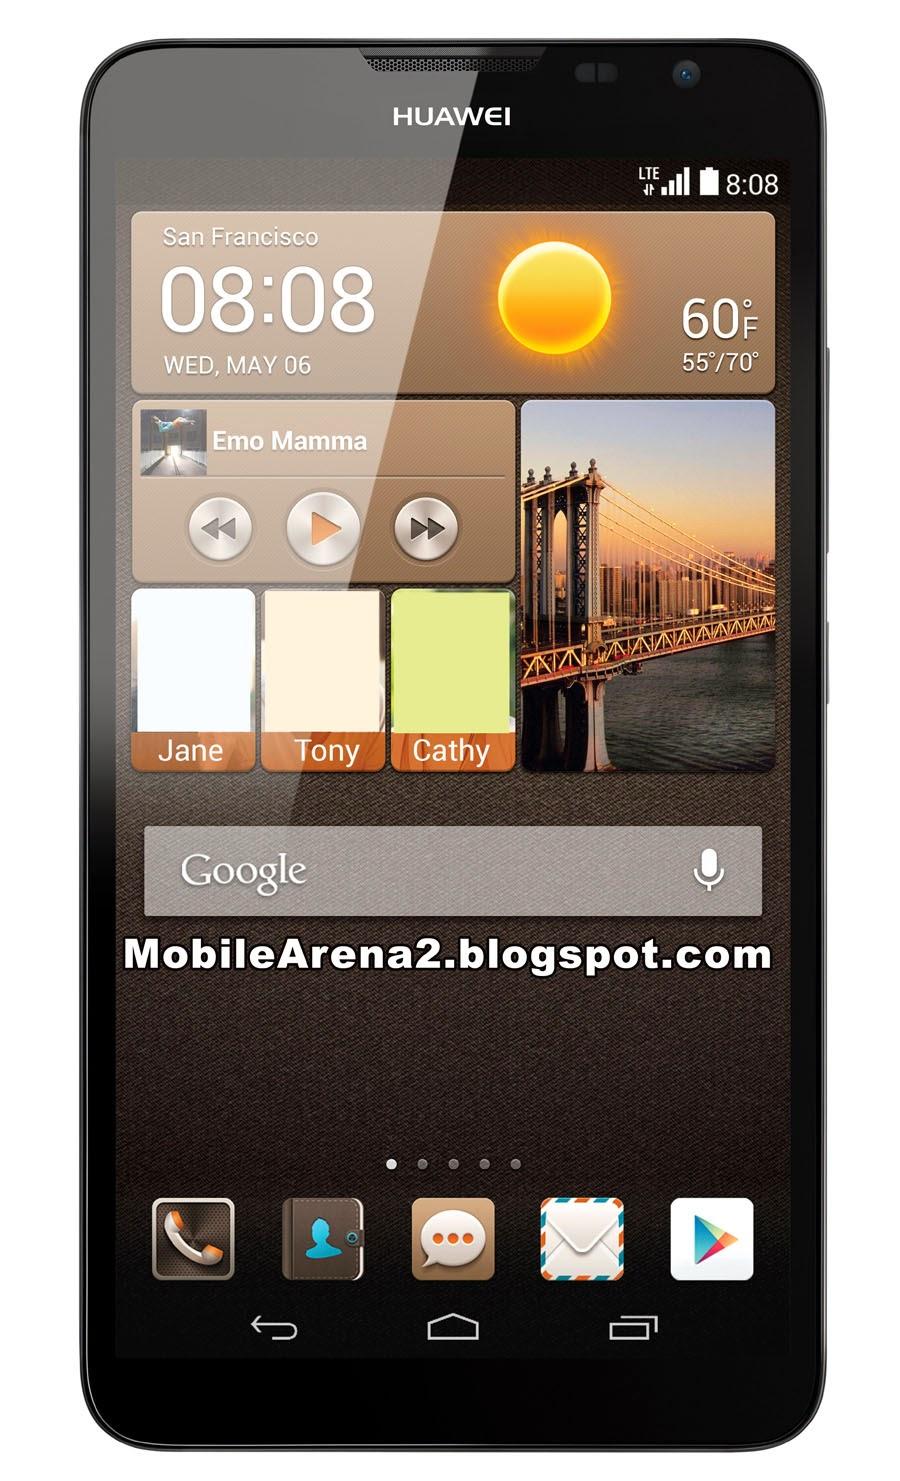 Huawei Ascend Mate2, MobileArena2.blogspto.com